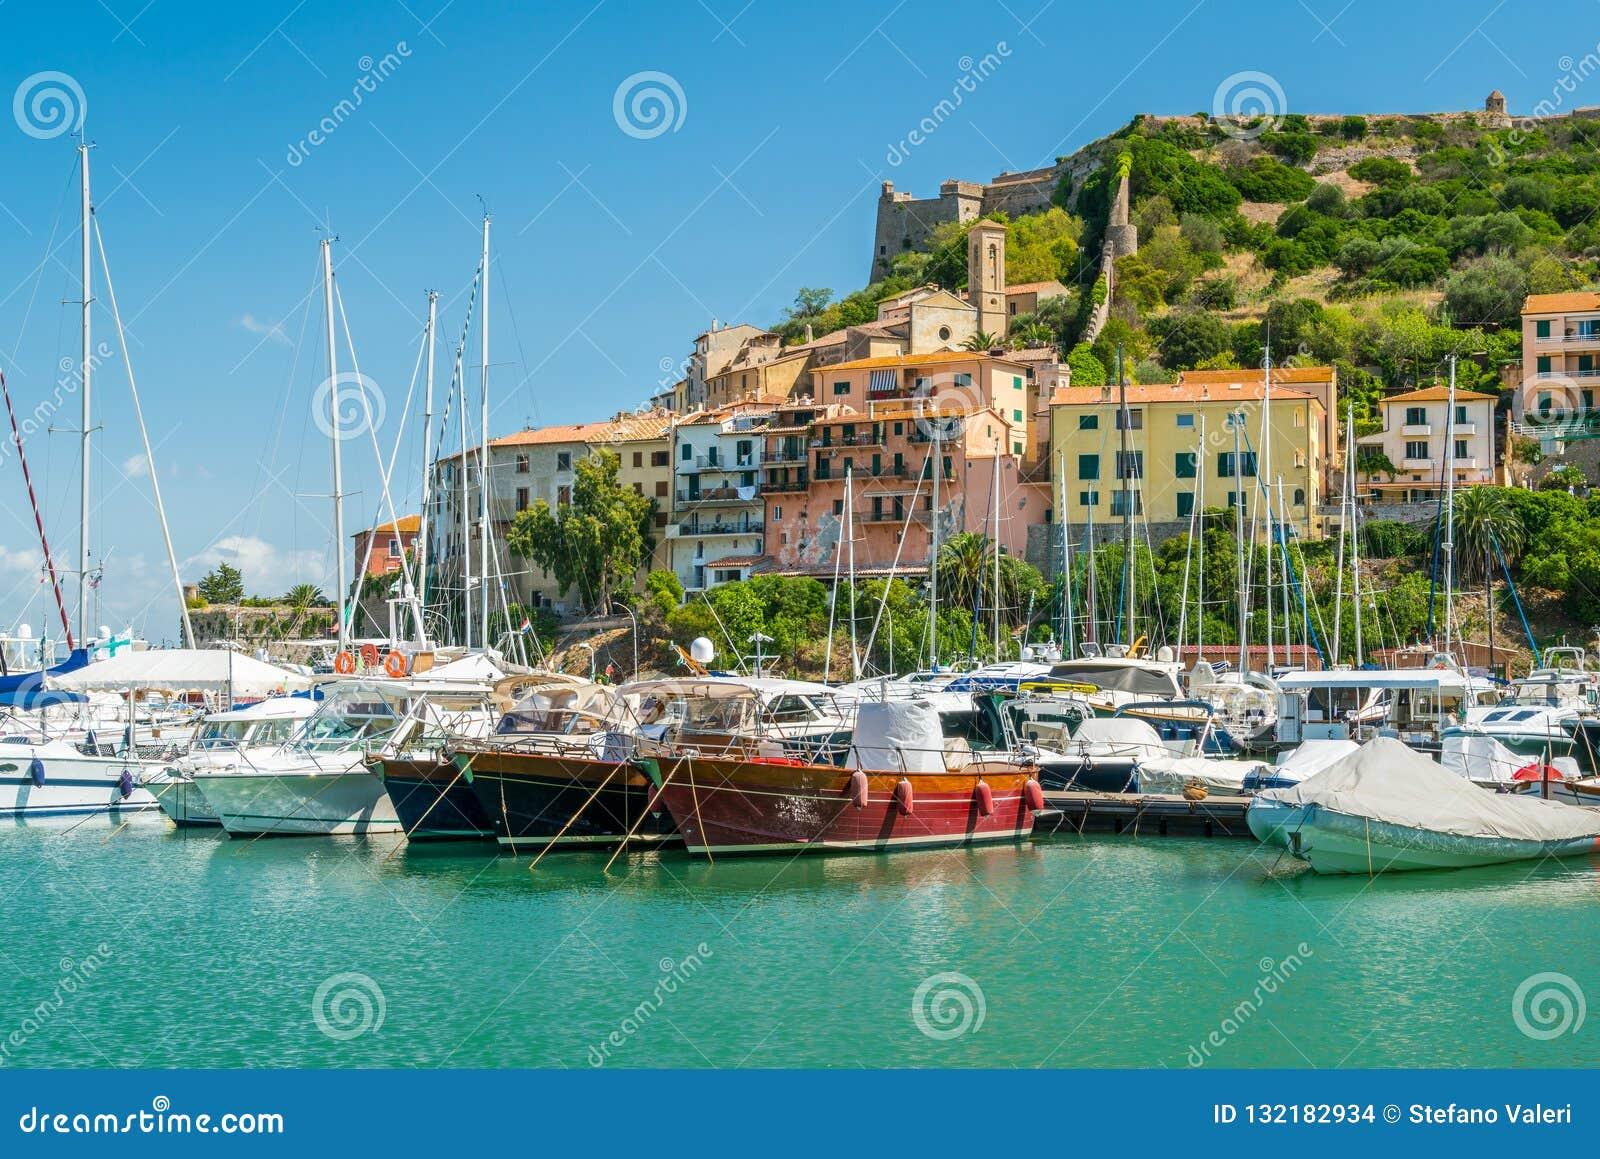 Porto Ercole, in Monte Argentario, in the Tuscany region of Italy.